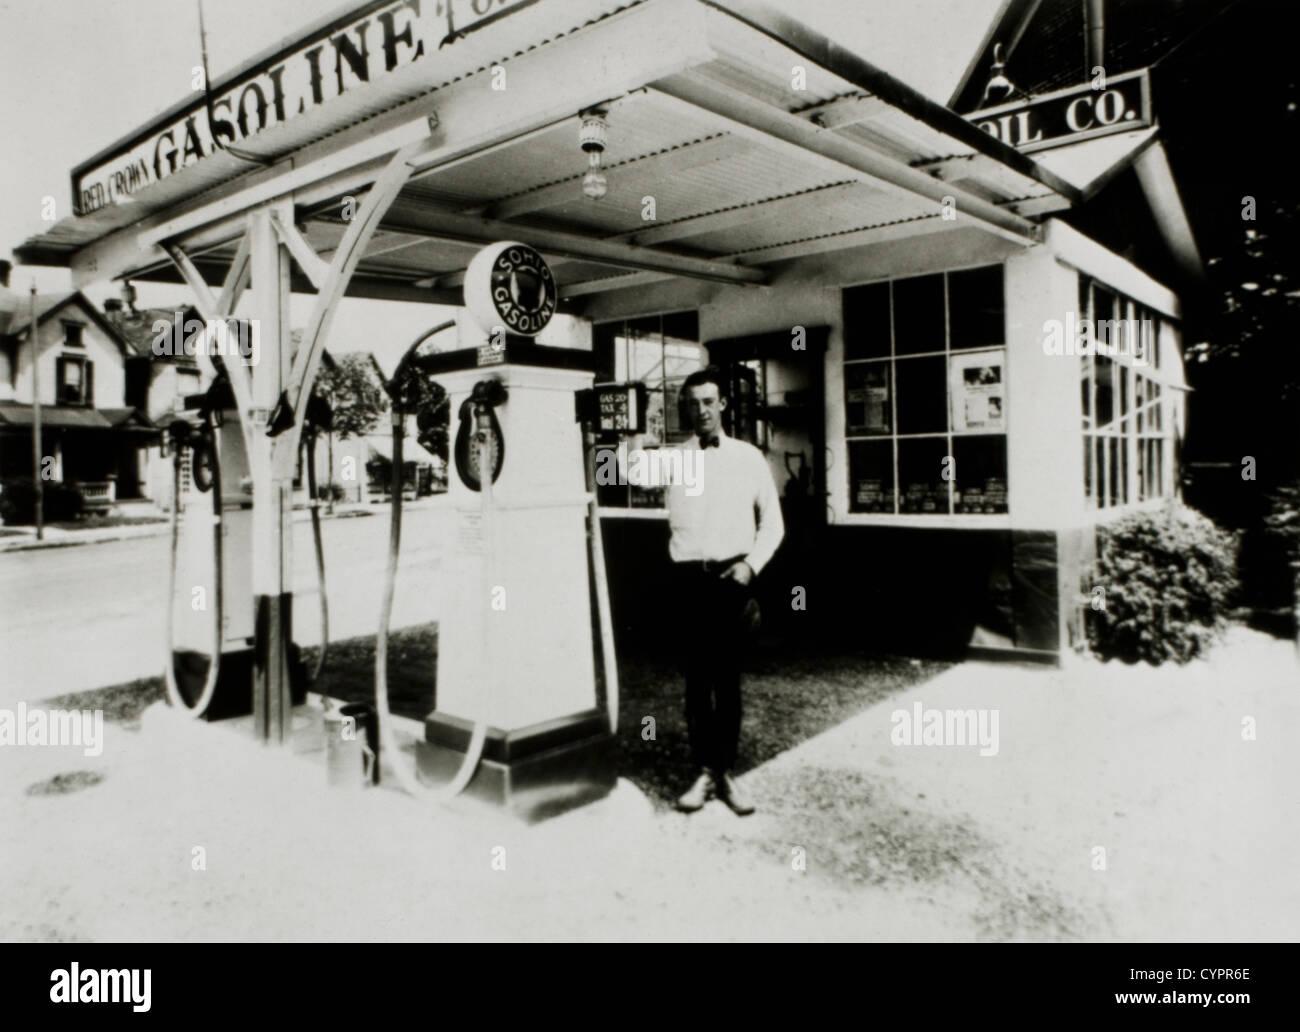 Man Standing Next to Gas Pump at Gasoline Station, Dayton, Ohio, USA, 1931 - Stock Image